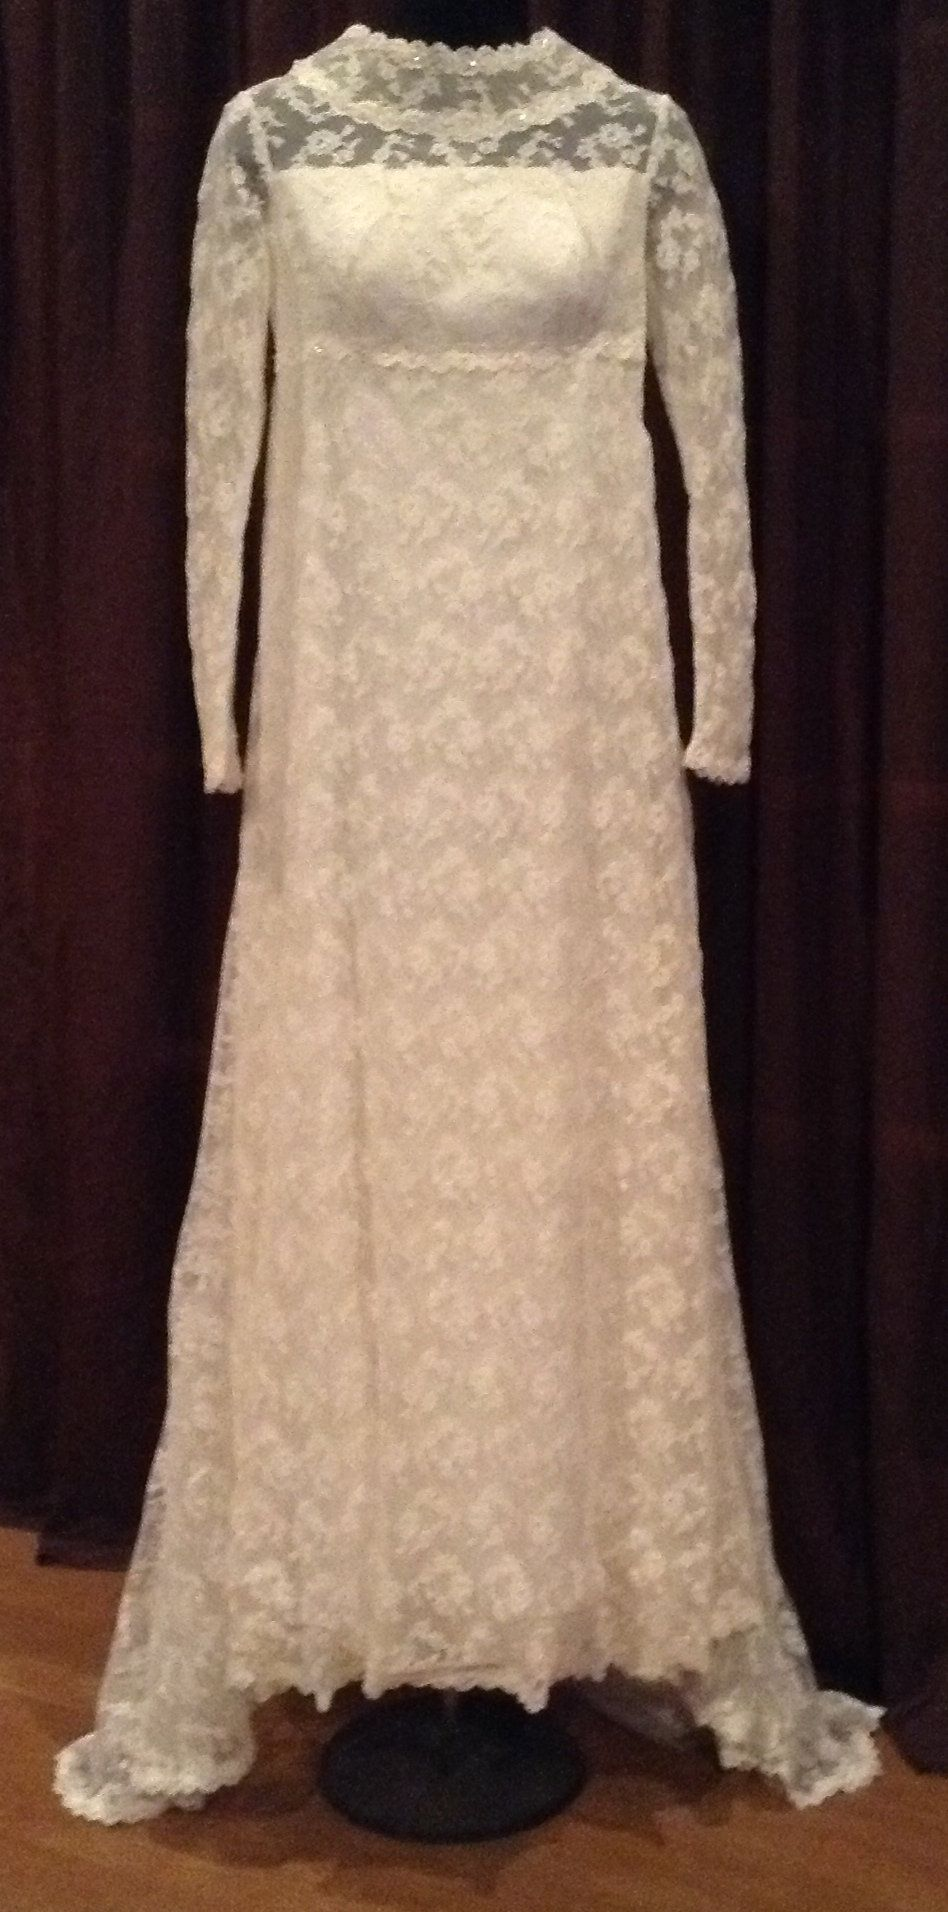 Vintage wedding dress aline ivory lace empire waist long sleeves